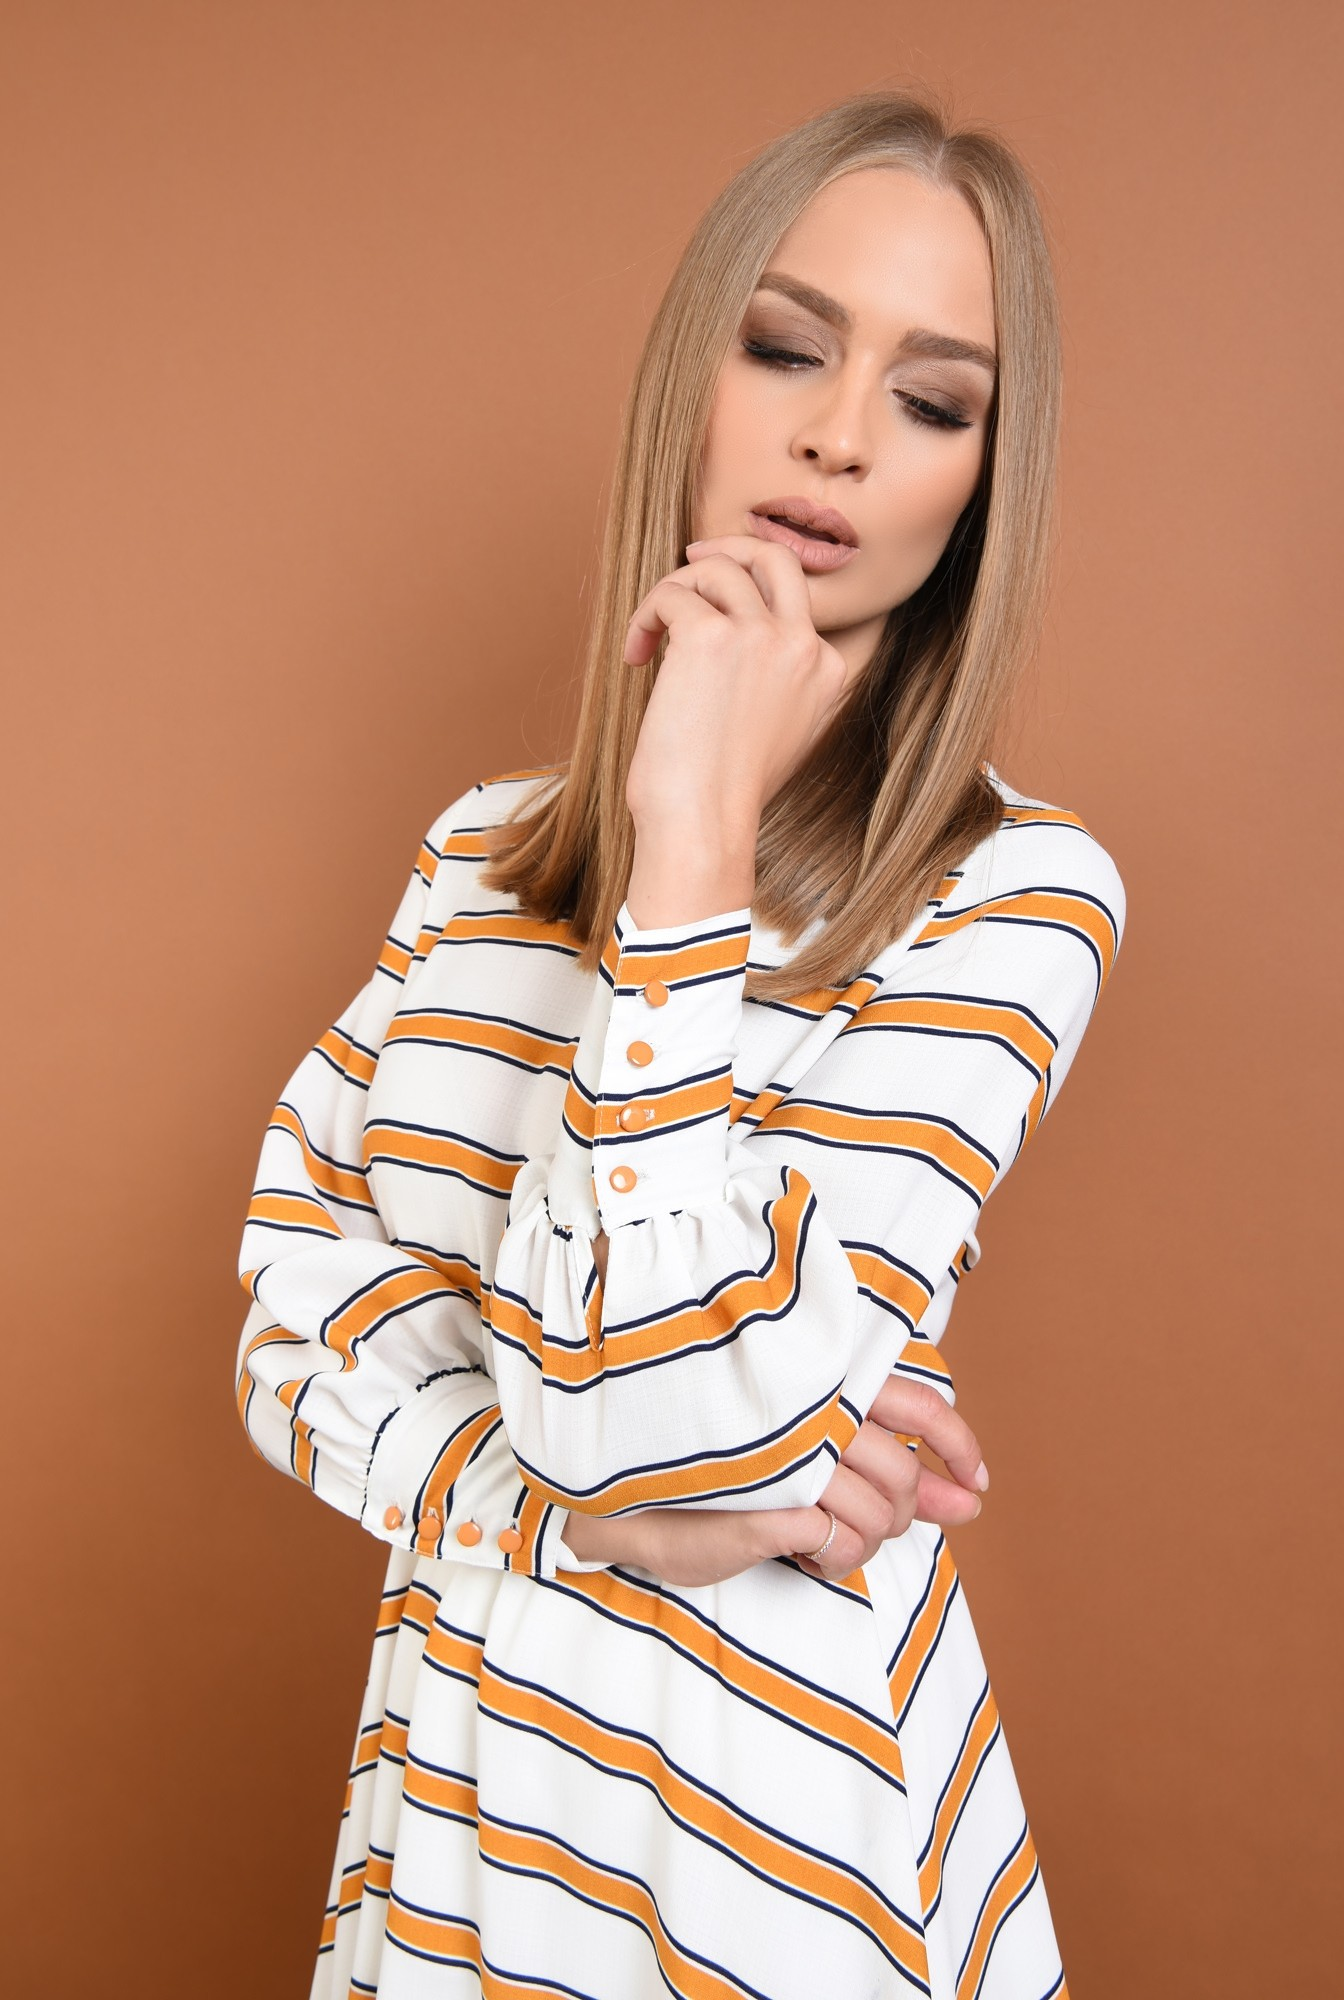 2 - 360 - rochie casual imprimata, alb, mustar, bie, cusatura in talie